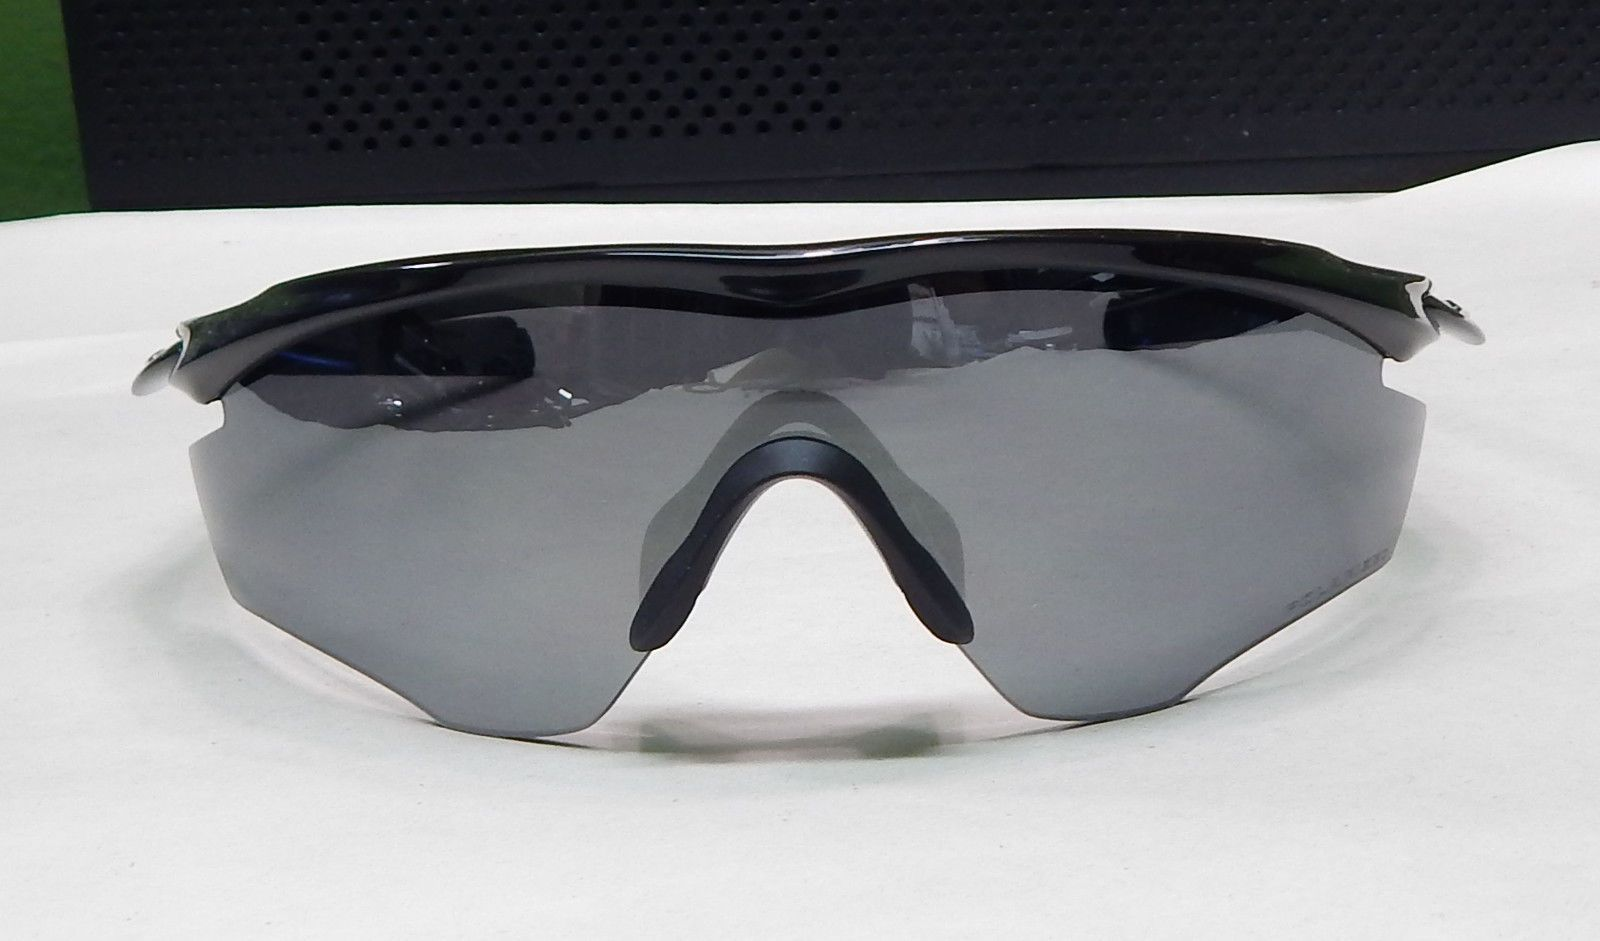 d2e23a4848e Oakley Sunglasses  M2 Frame Asian Fit - Polished Black -Black Iridium  Polarized